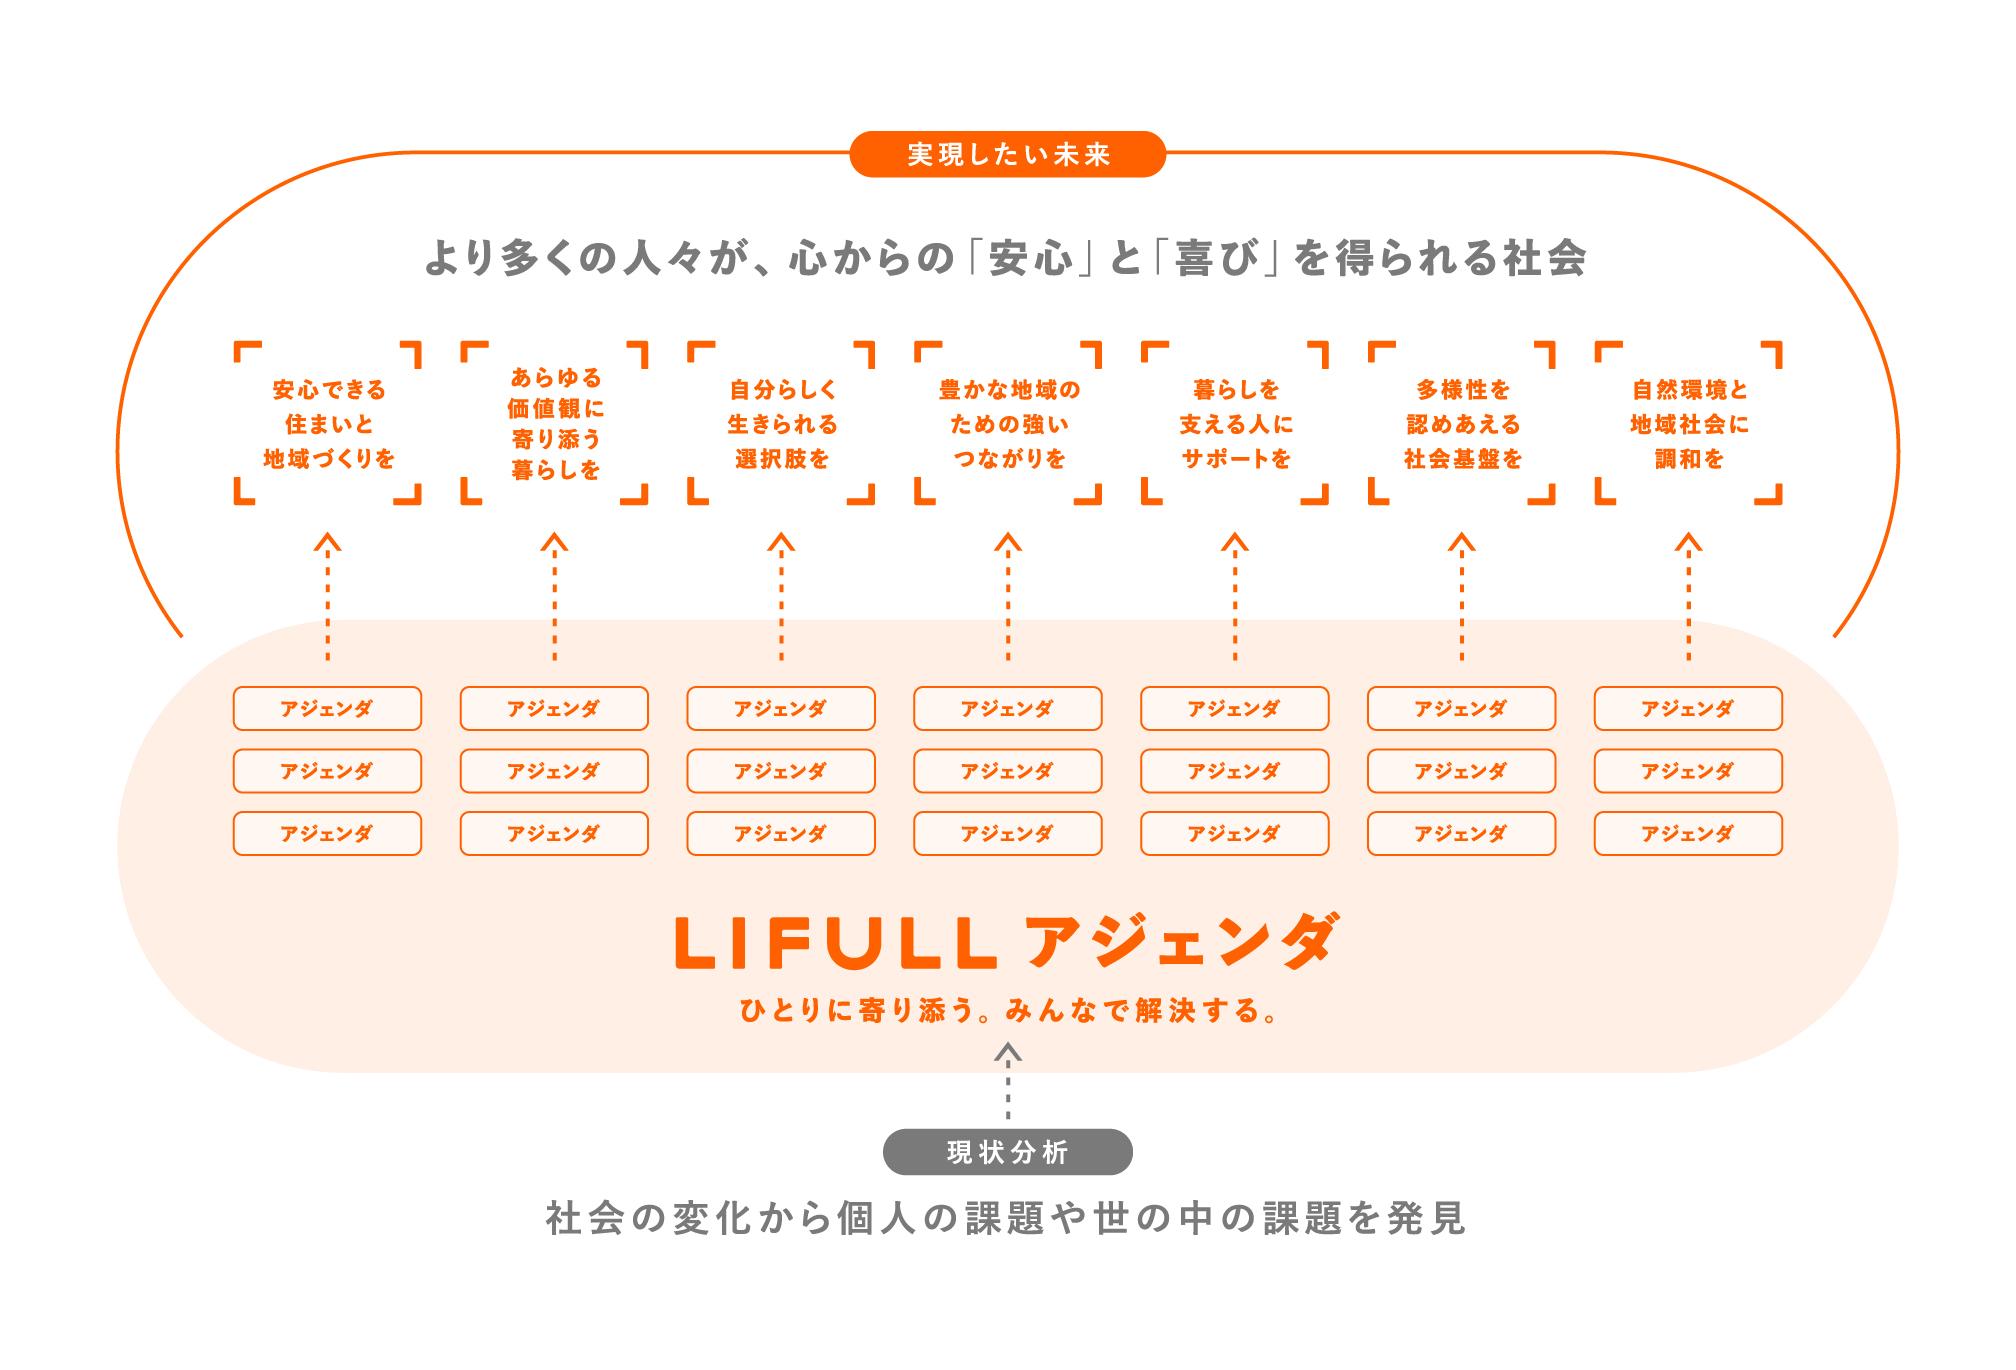 LIFULLアジェンダの構造図。実現したい未来を7つのゴールにまとめました。